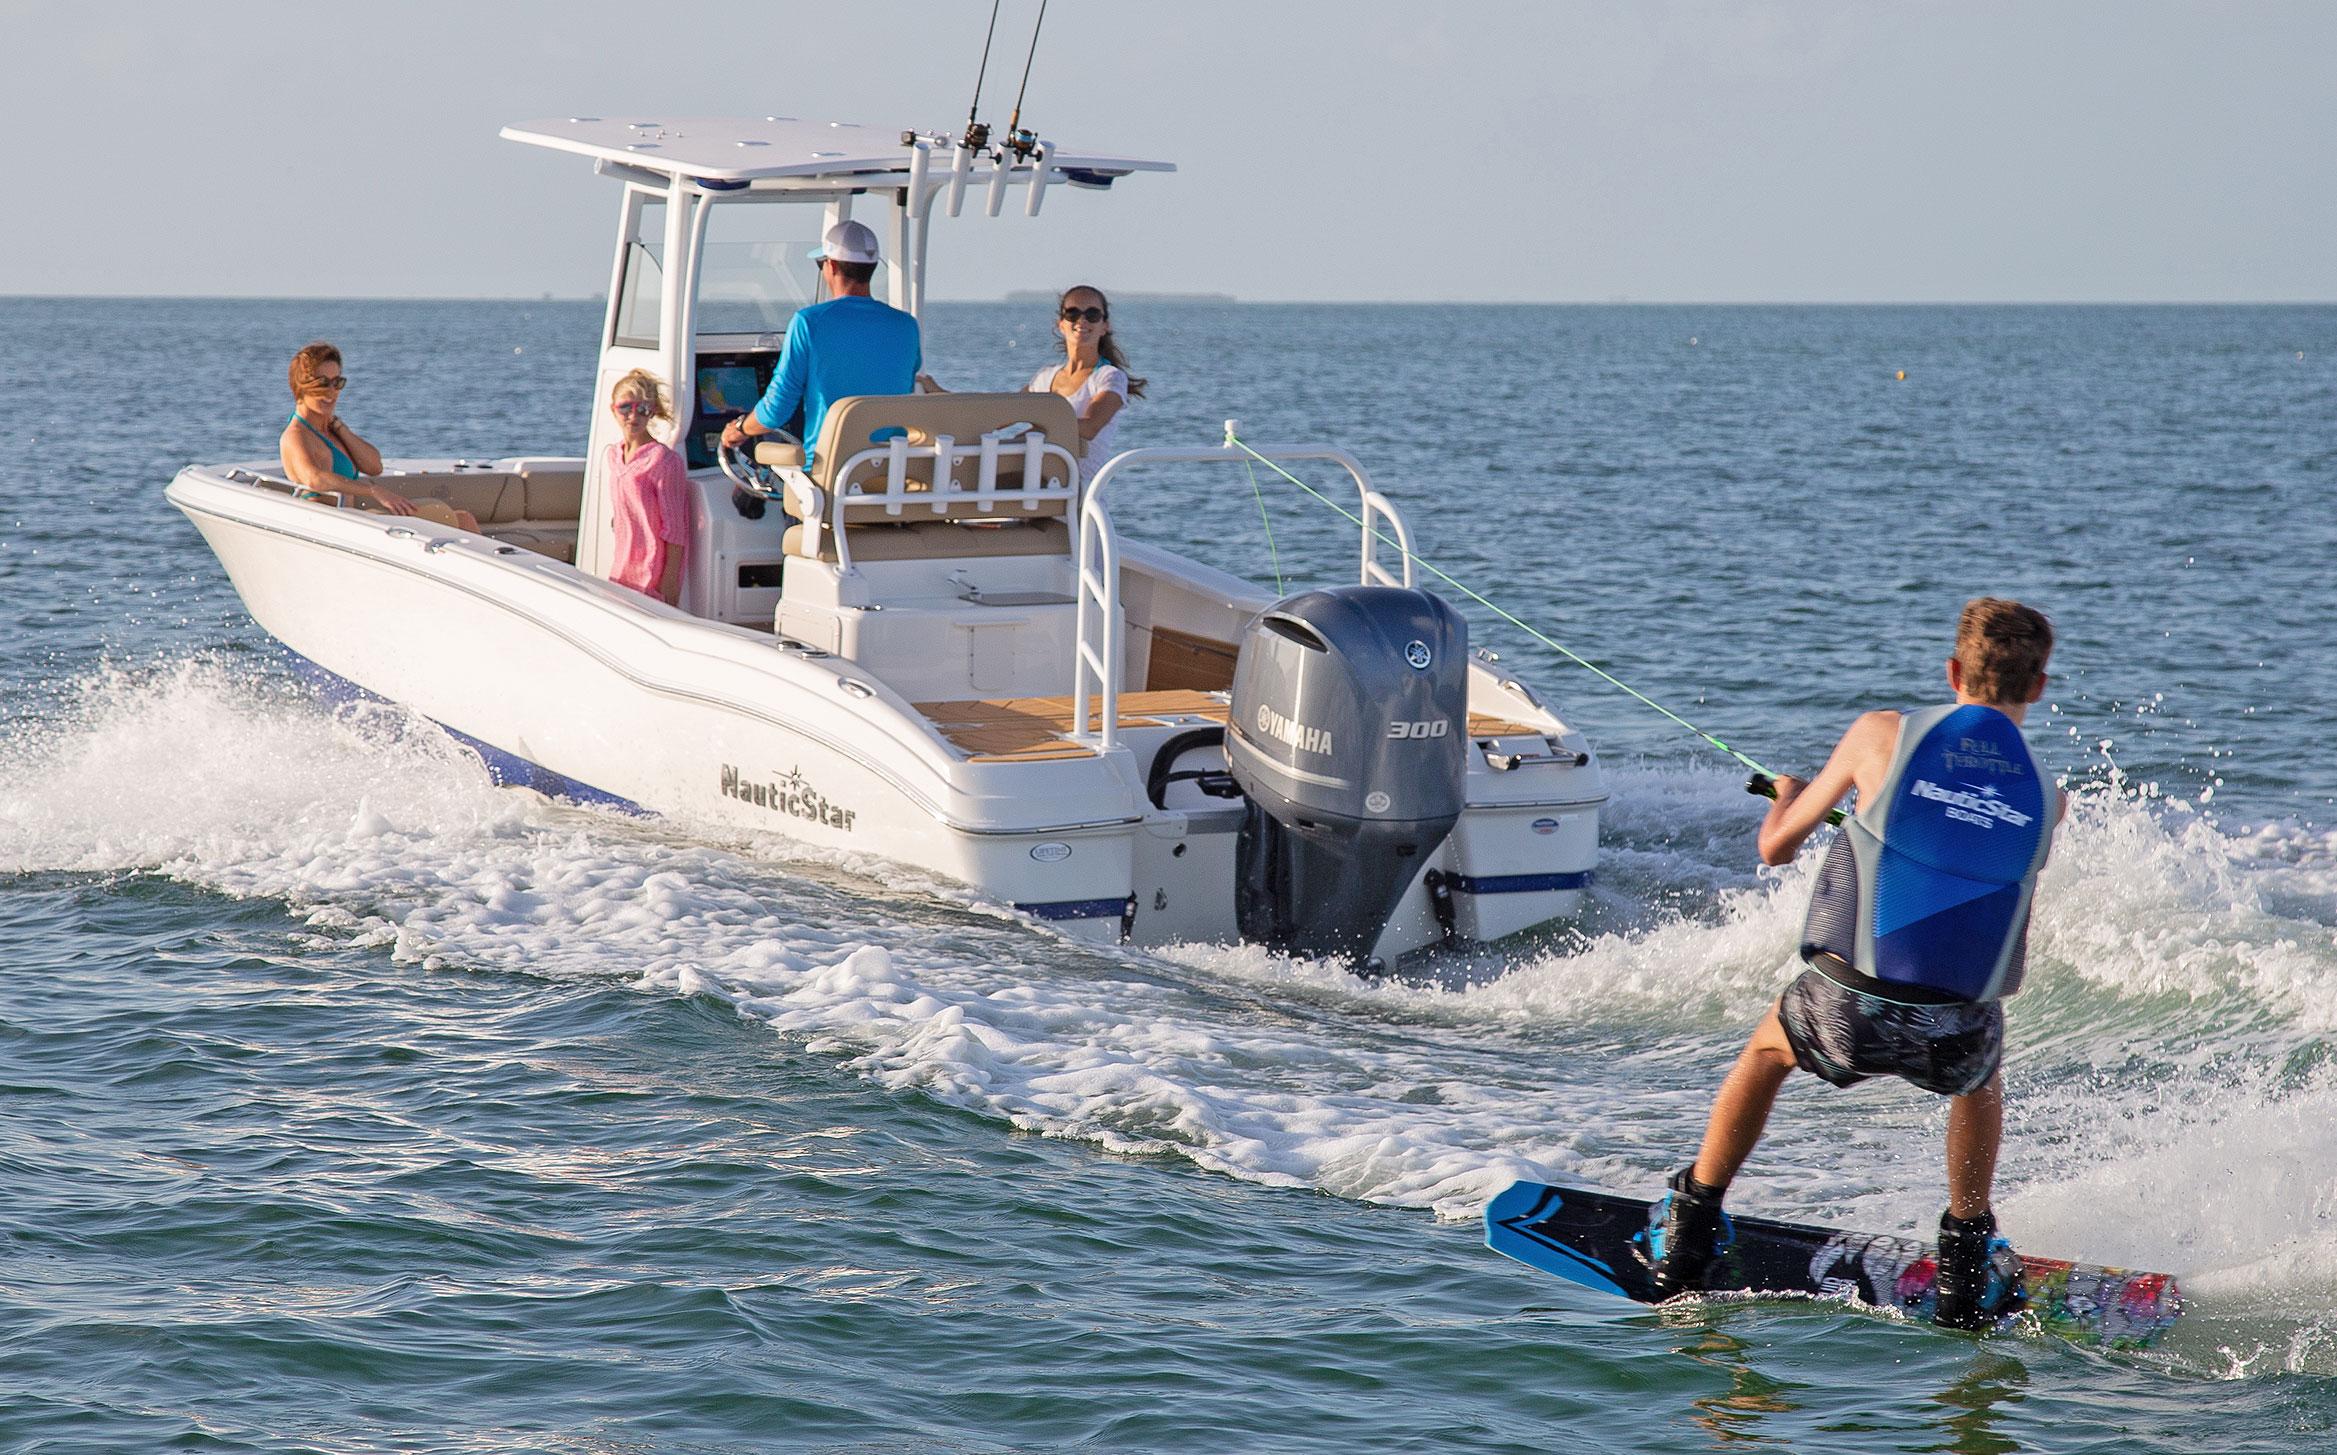 NauticStar Boats | Bay Boats, Deck Boats and Offshore Boats